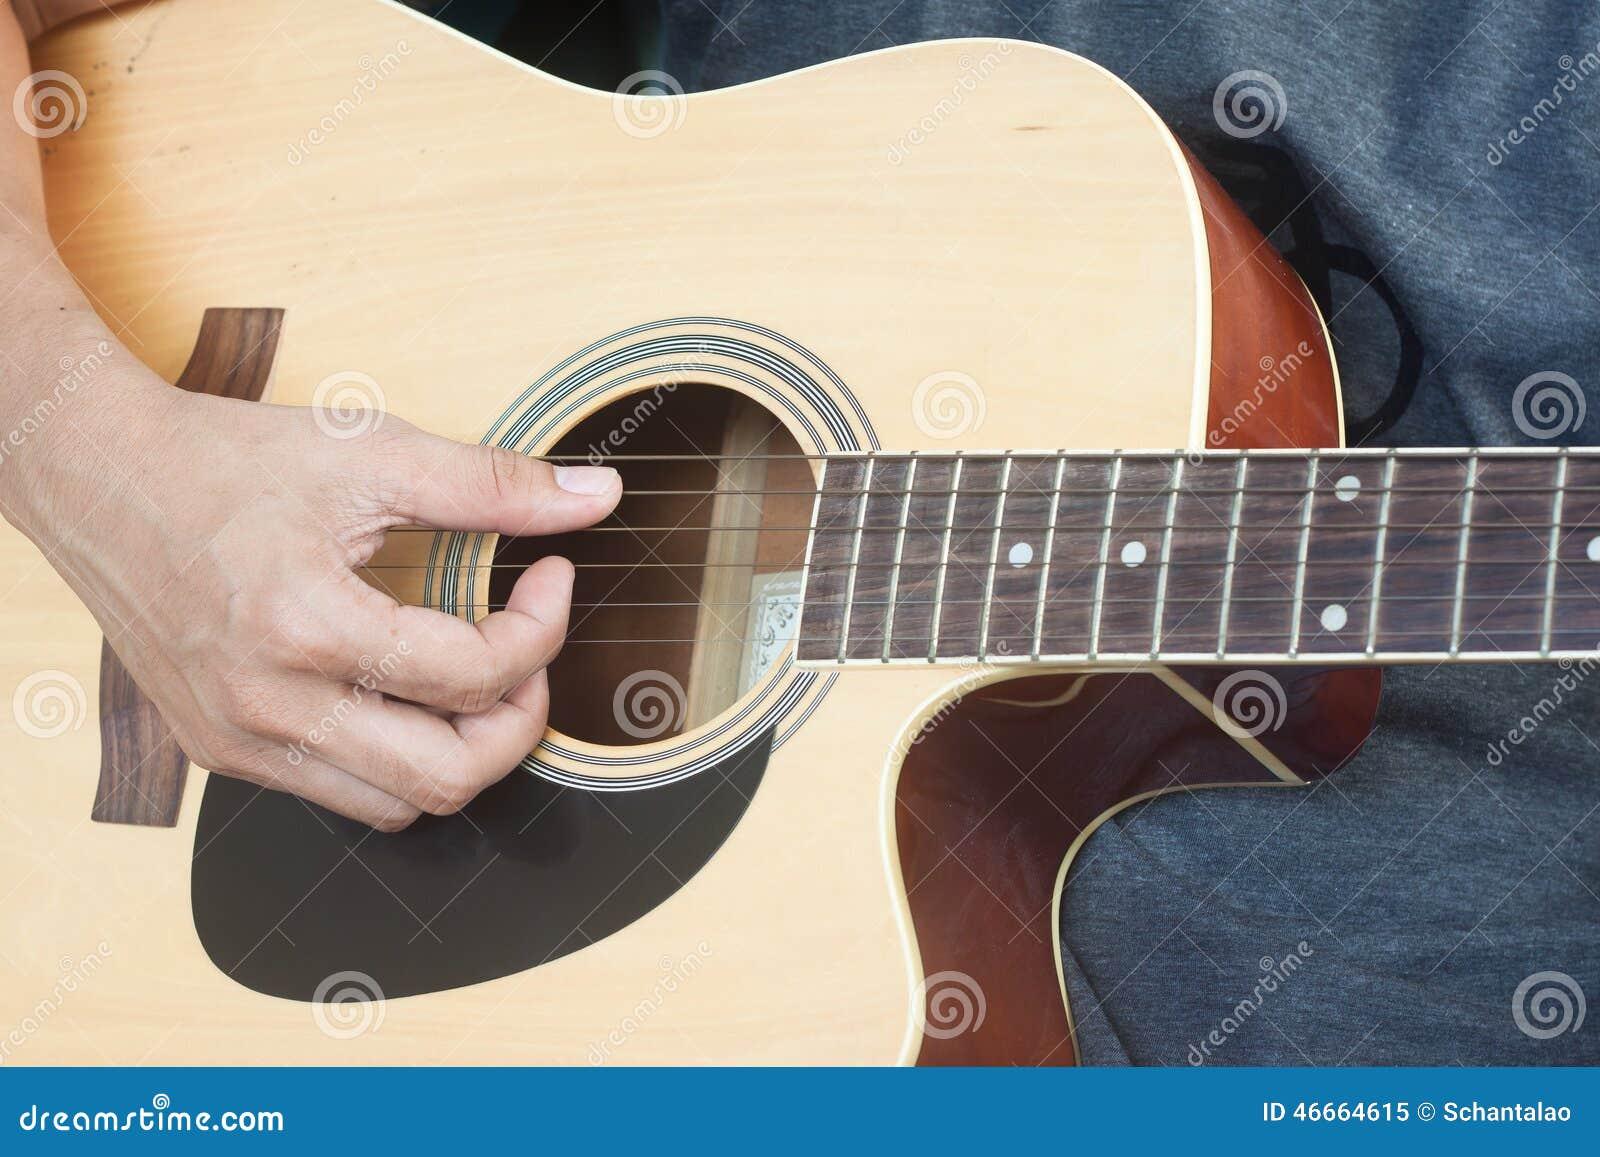 guitarist plays stock photo image 46664615. Black Bedroom Furniture Sets. Home Design Ideas